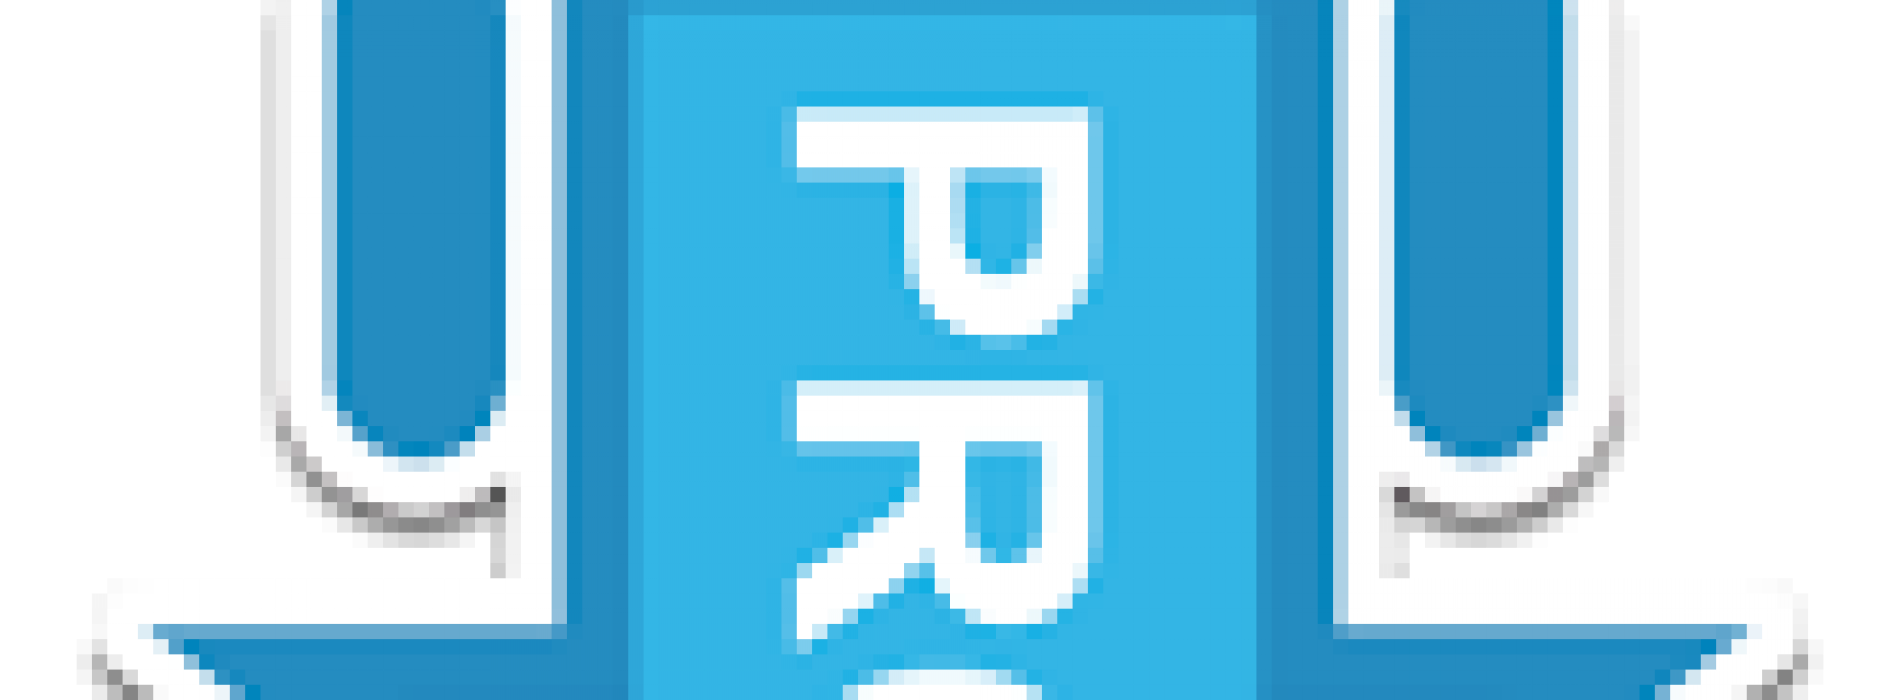 [ اندرويد ] برنامج aTorrent PRO للتحميل تورنت